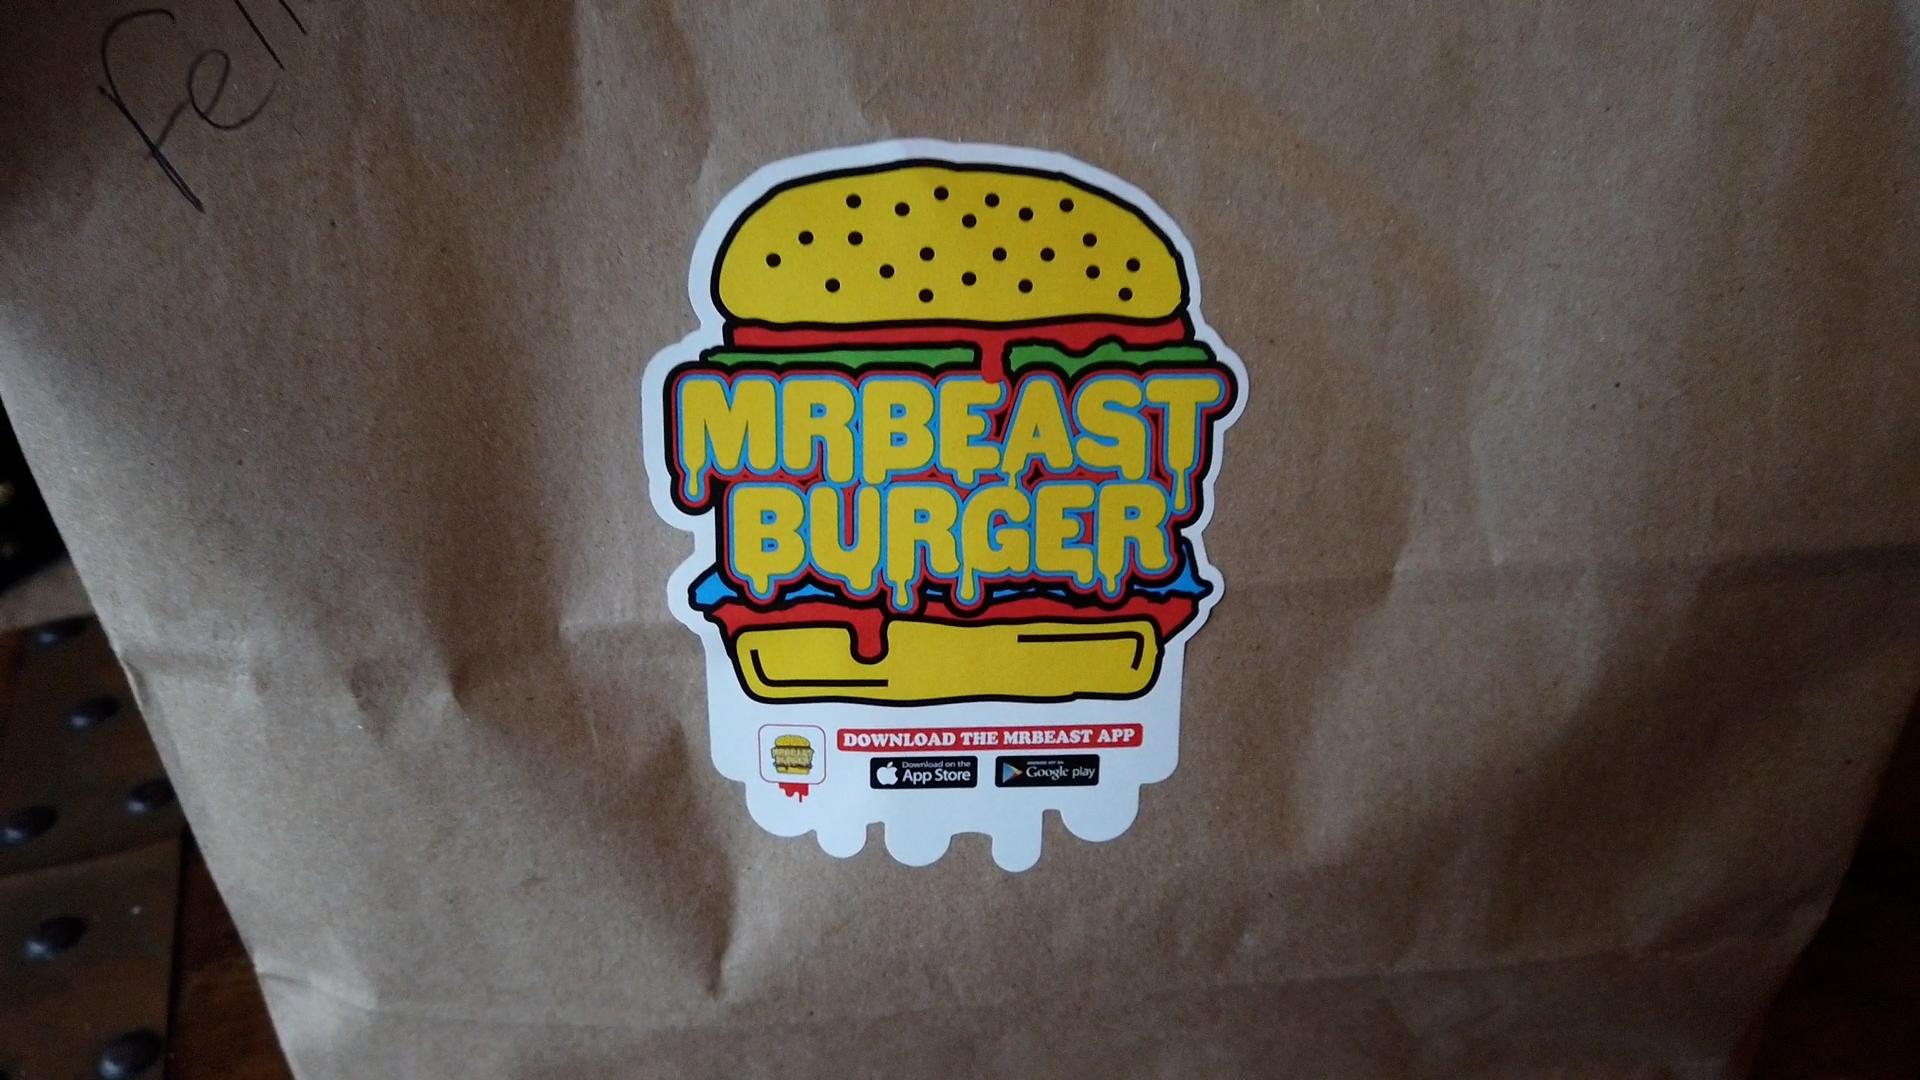 mrbeast burger order